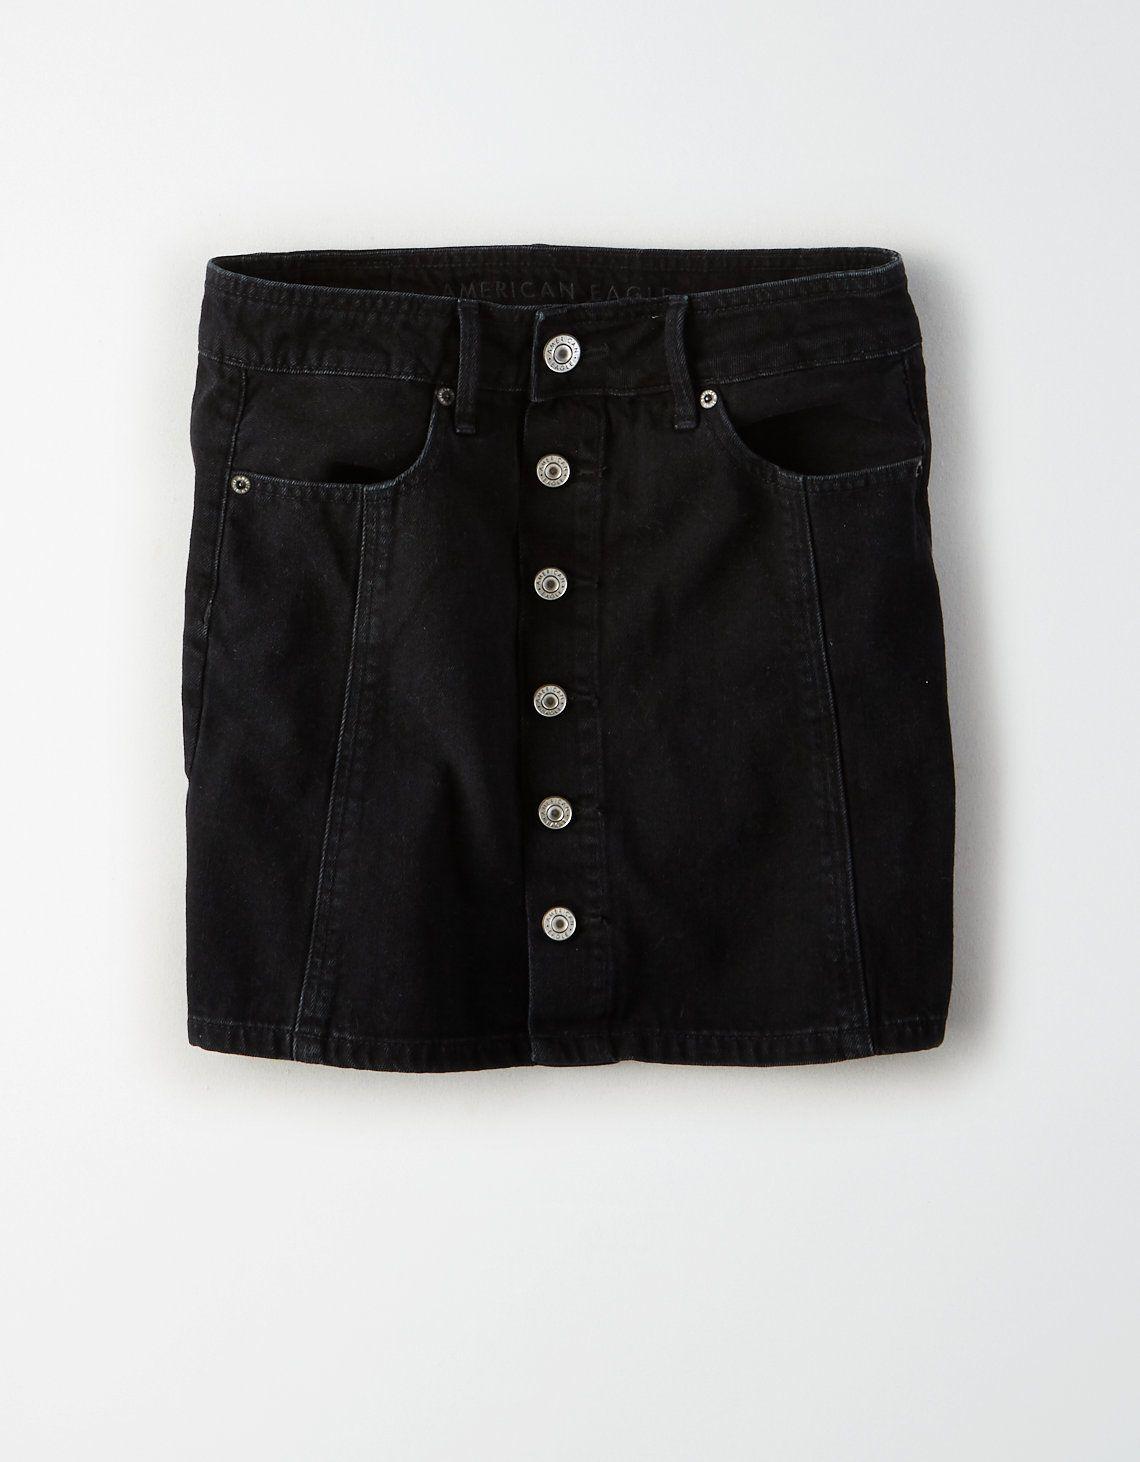 f05b662e73 Product Image Black Denim Shorts, Denim Skirt, Casual Shorts, Front Design,  Cotton